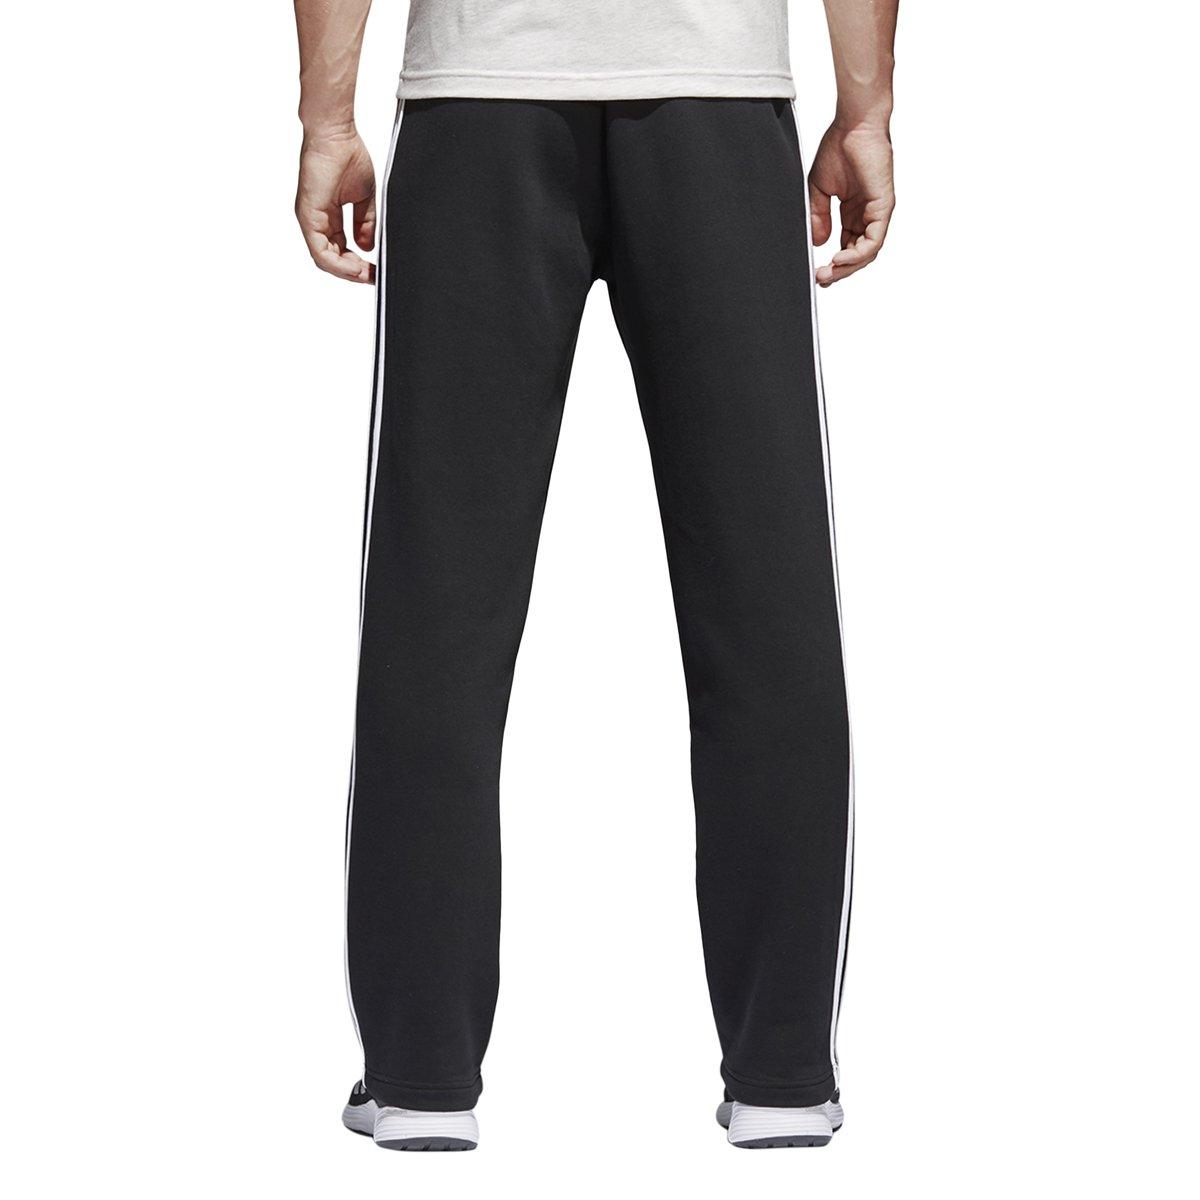 1bb1844ab74f5 Amazon.com   adidas Men s Essentials 3 Stripe Regular Fit Fleece Pants    Clothing